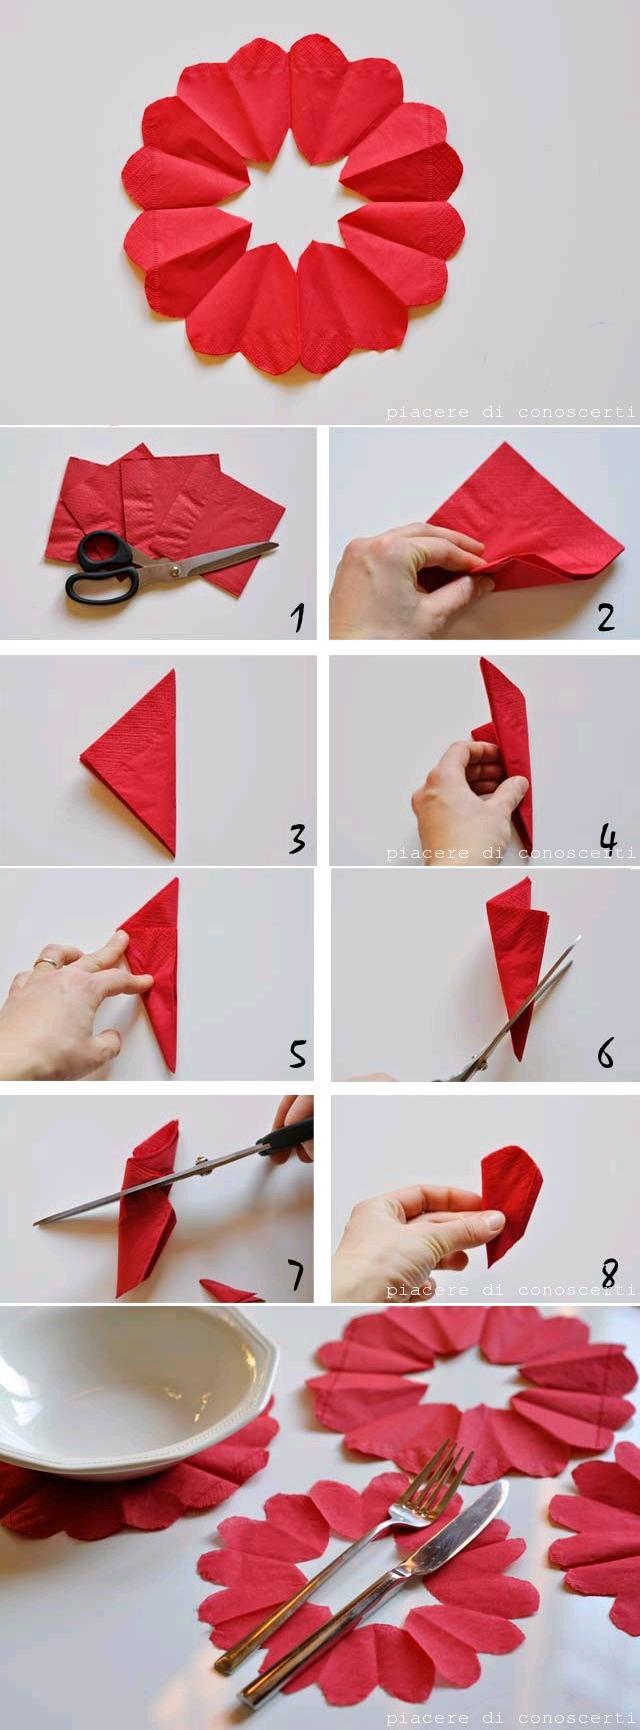 Imagen de http://www.icreativeideas.com/wp-content/uploads/2014/02/DIY-Valentines-Napkin-Ornament.jpg.